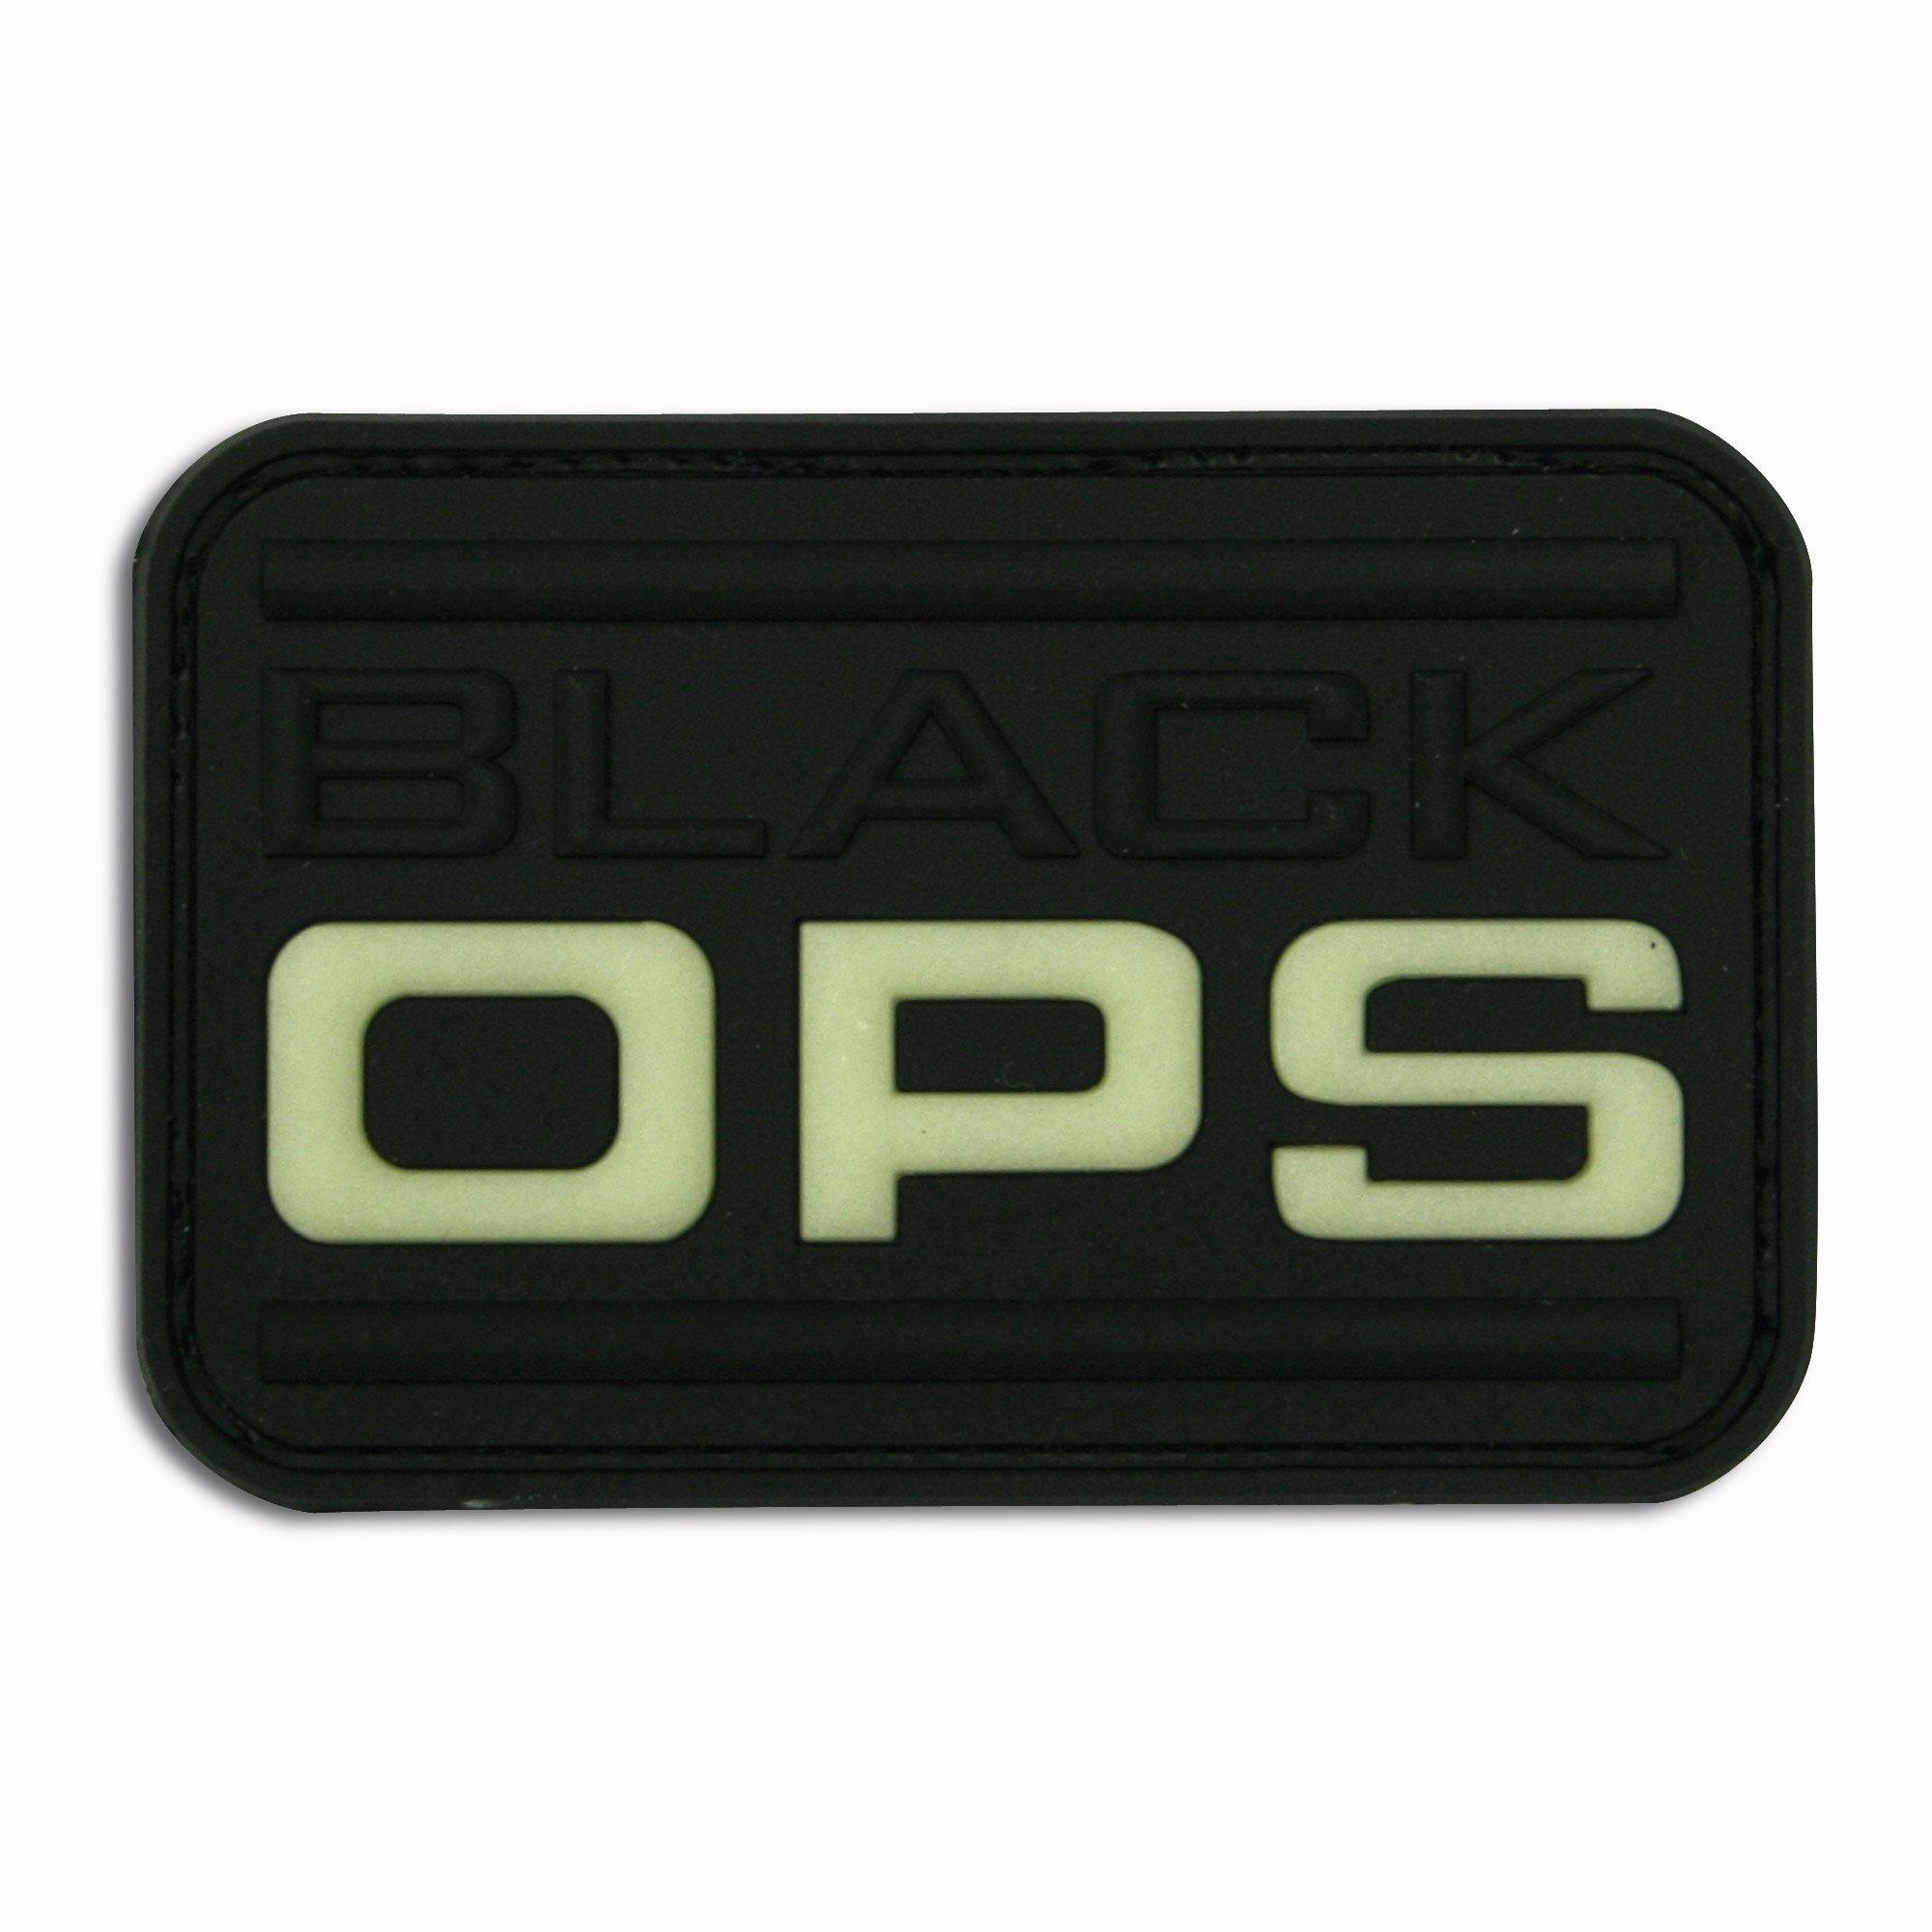 3D-Patch Black Ops blackops modello precedente